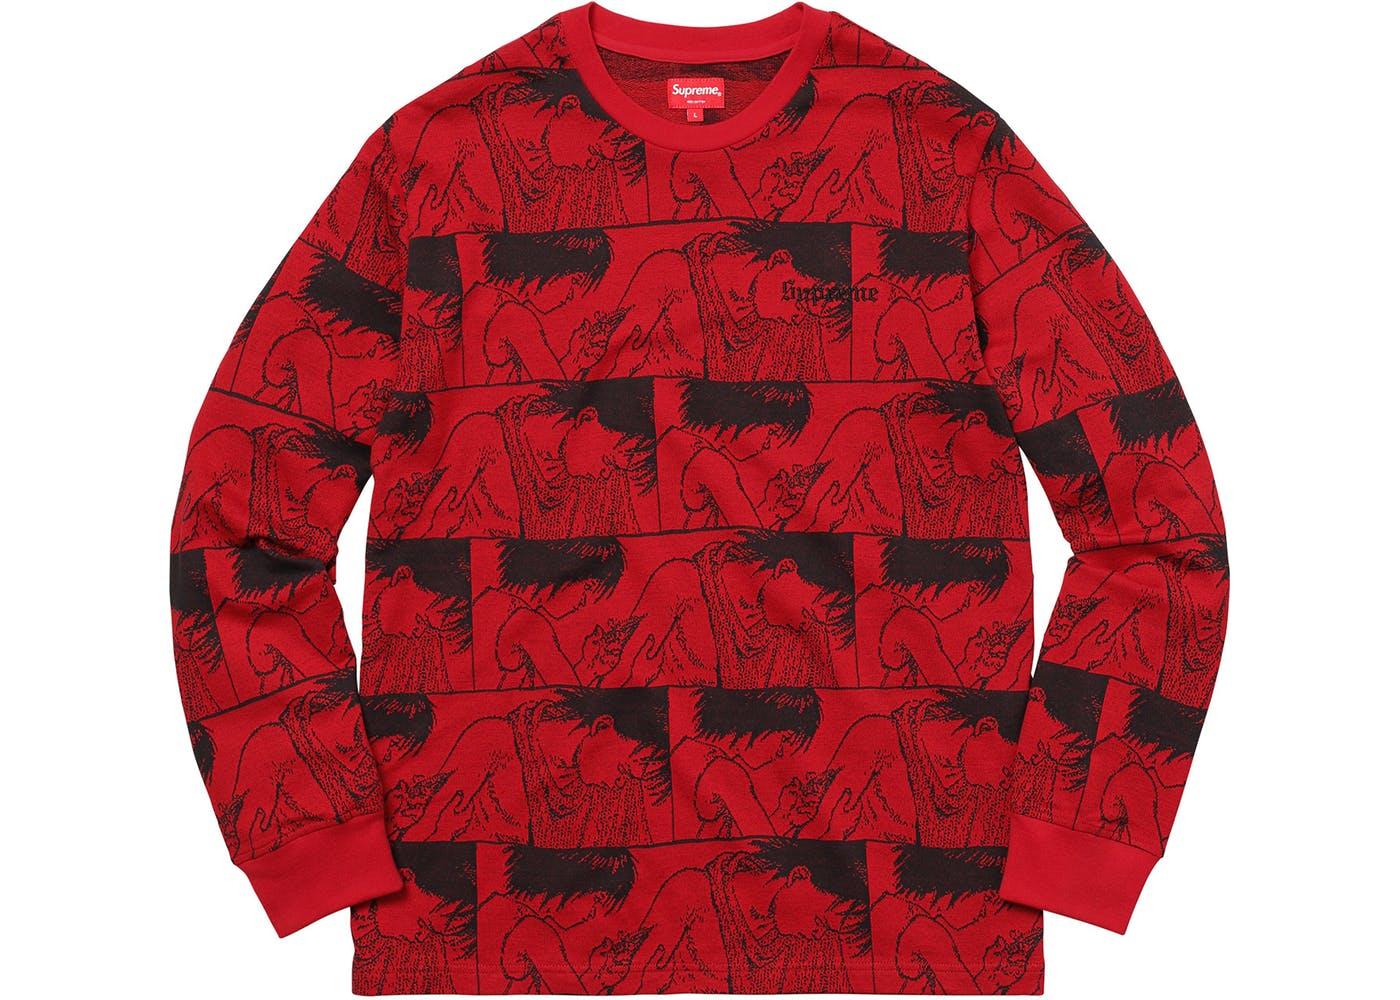 6de3fc192d8 Red Supreme AKIRA Syringe Jacquard Long Sleeve - StockX News